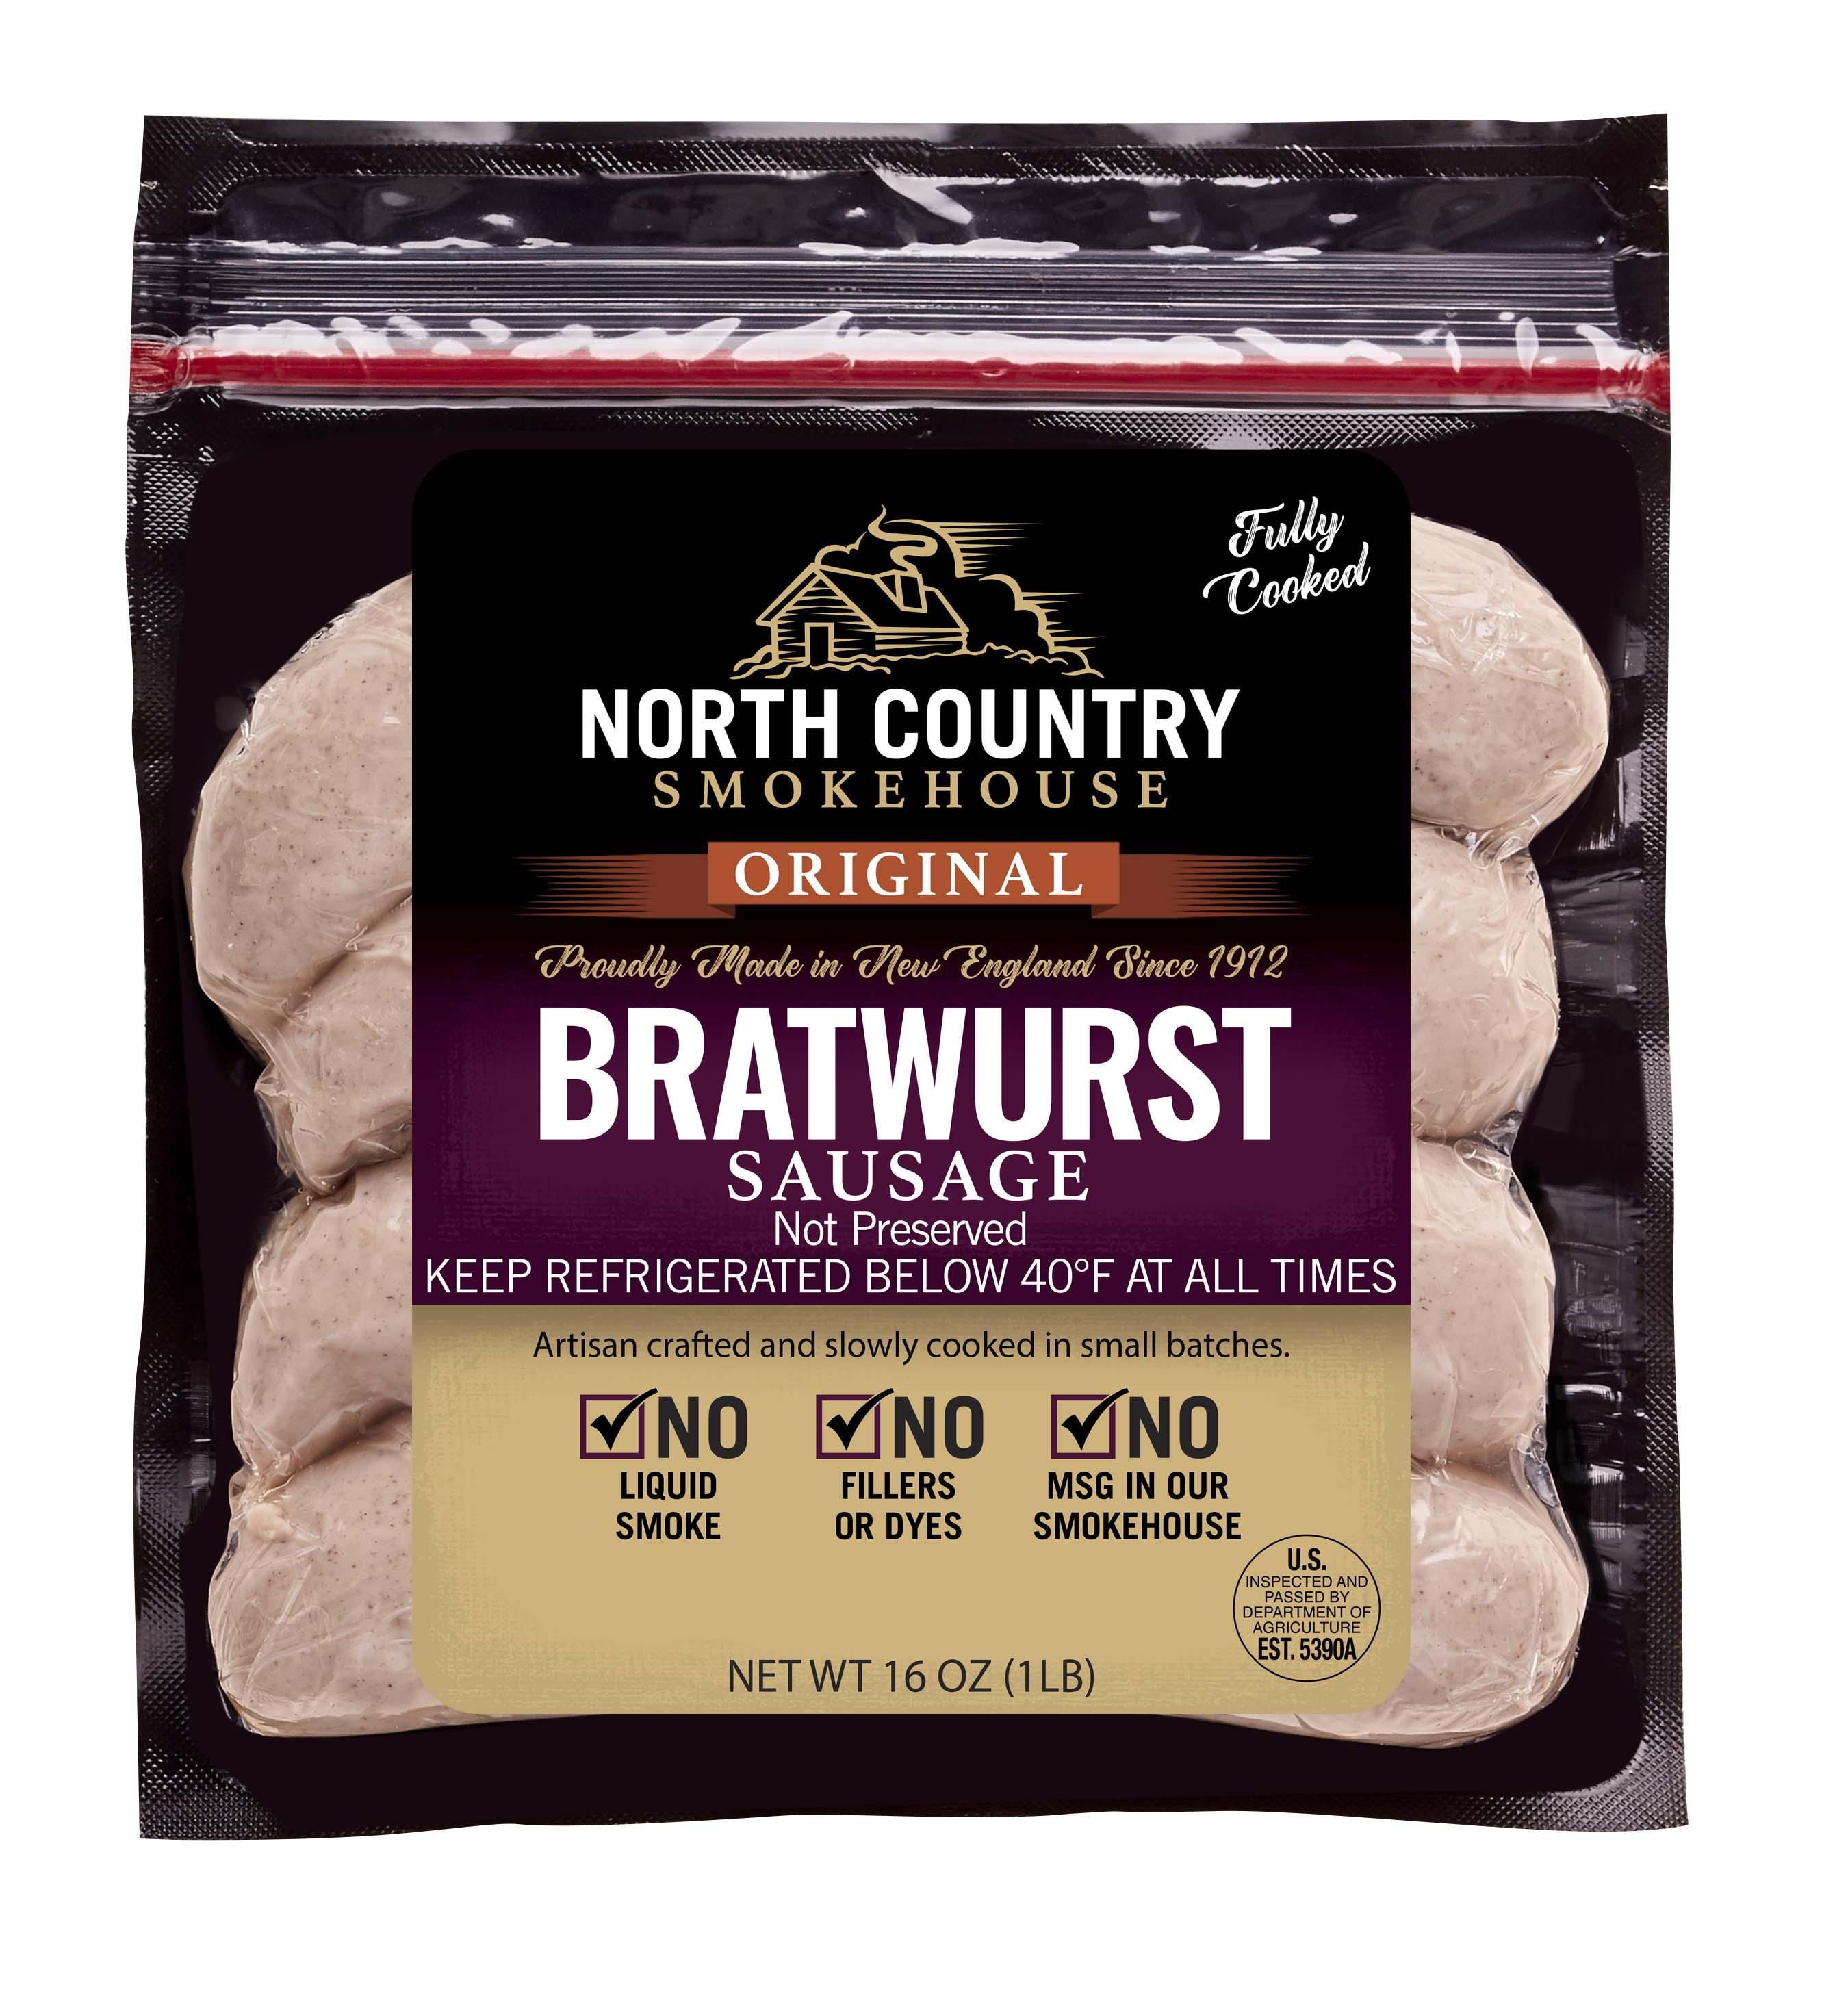 Original Bratwurst Sausage - 3, 1 lb. packages